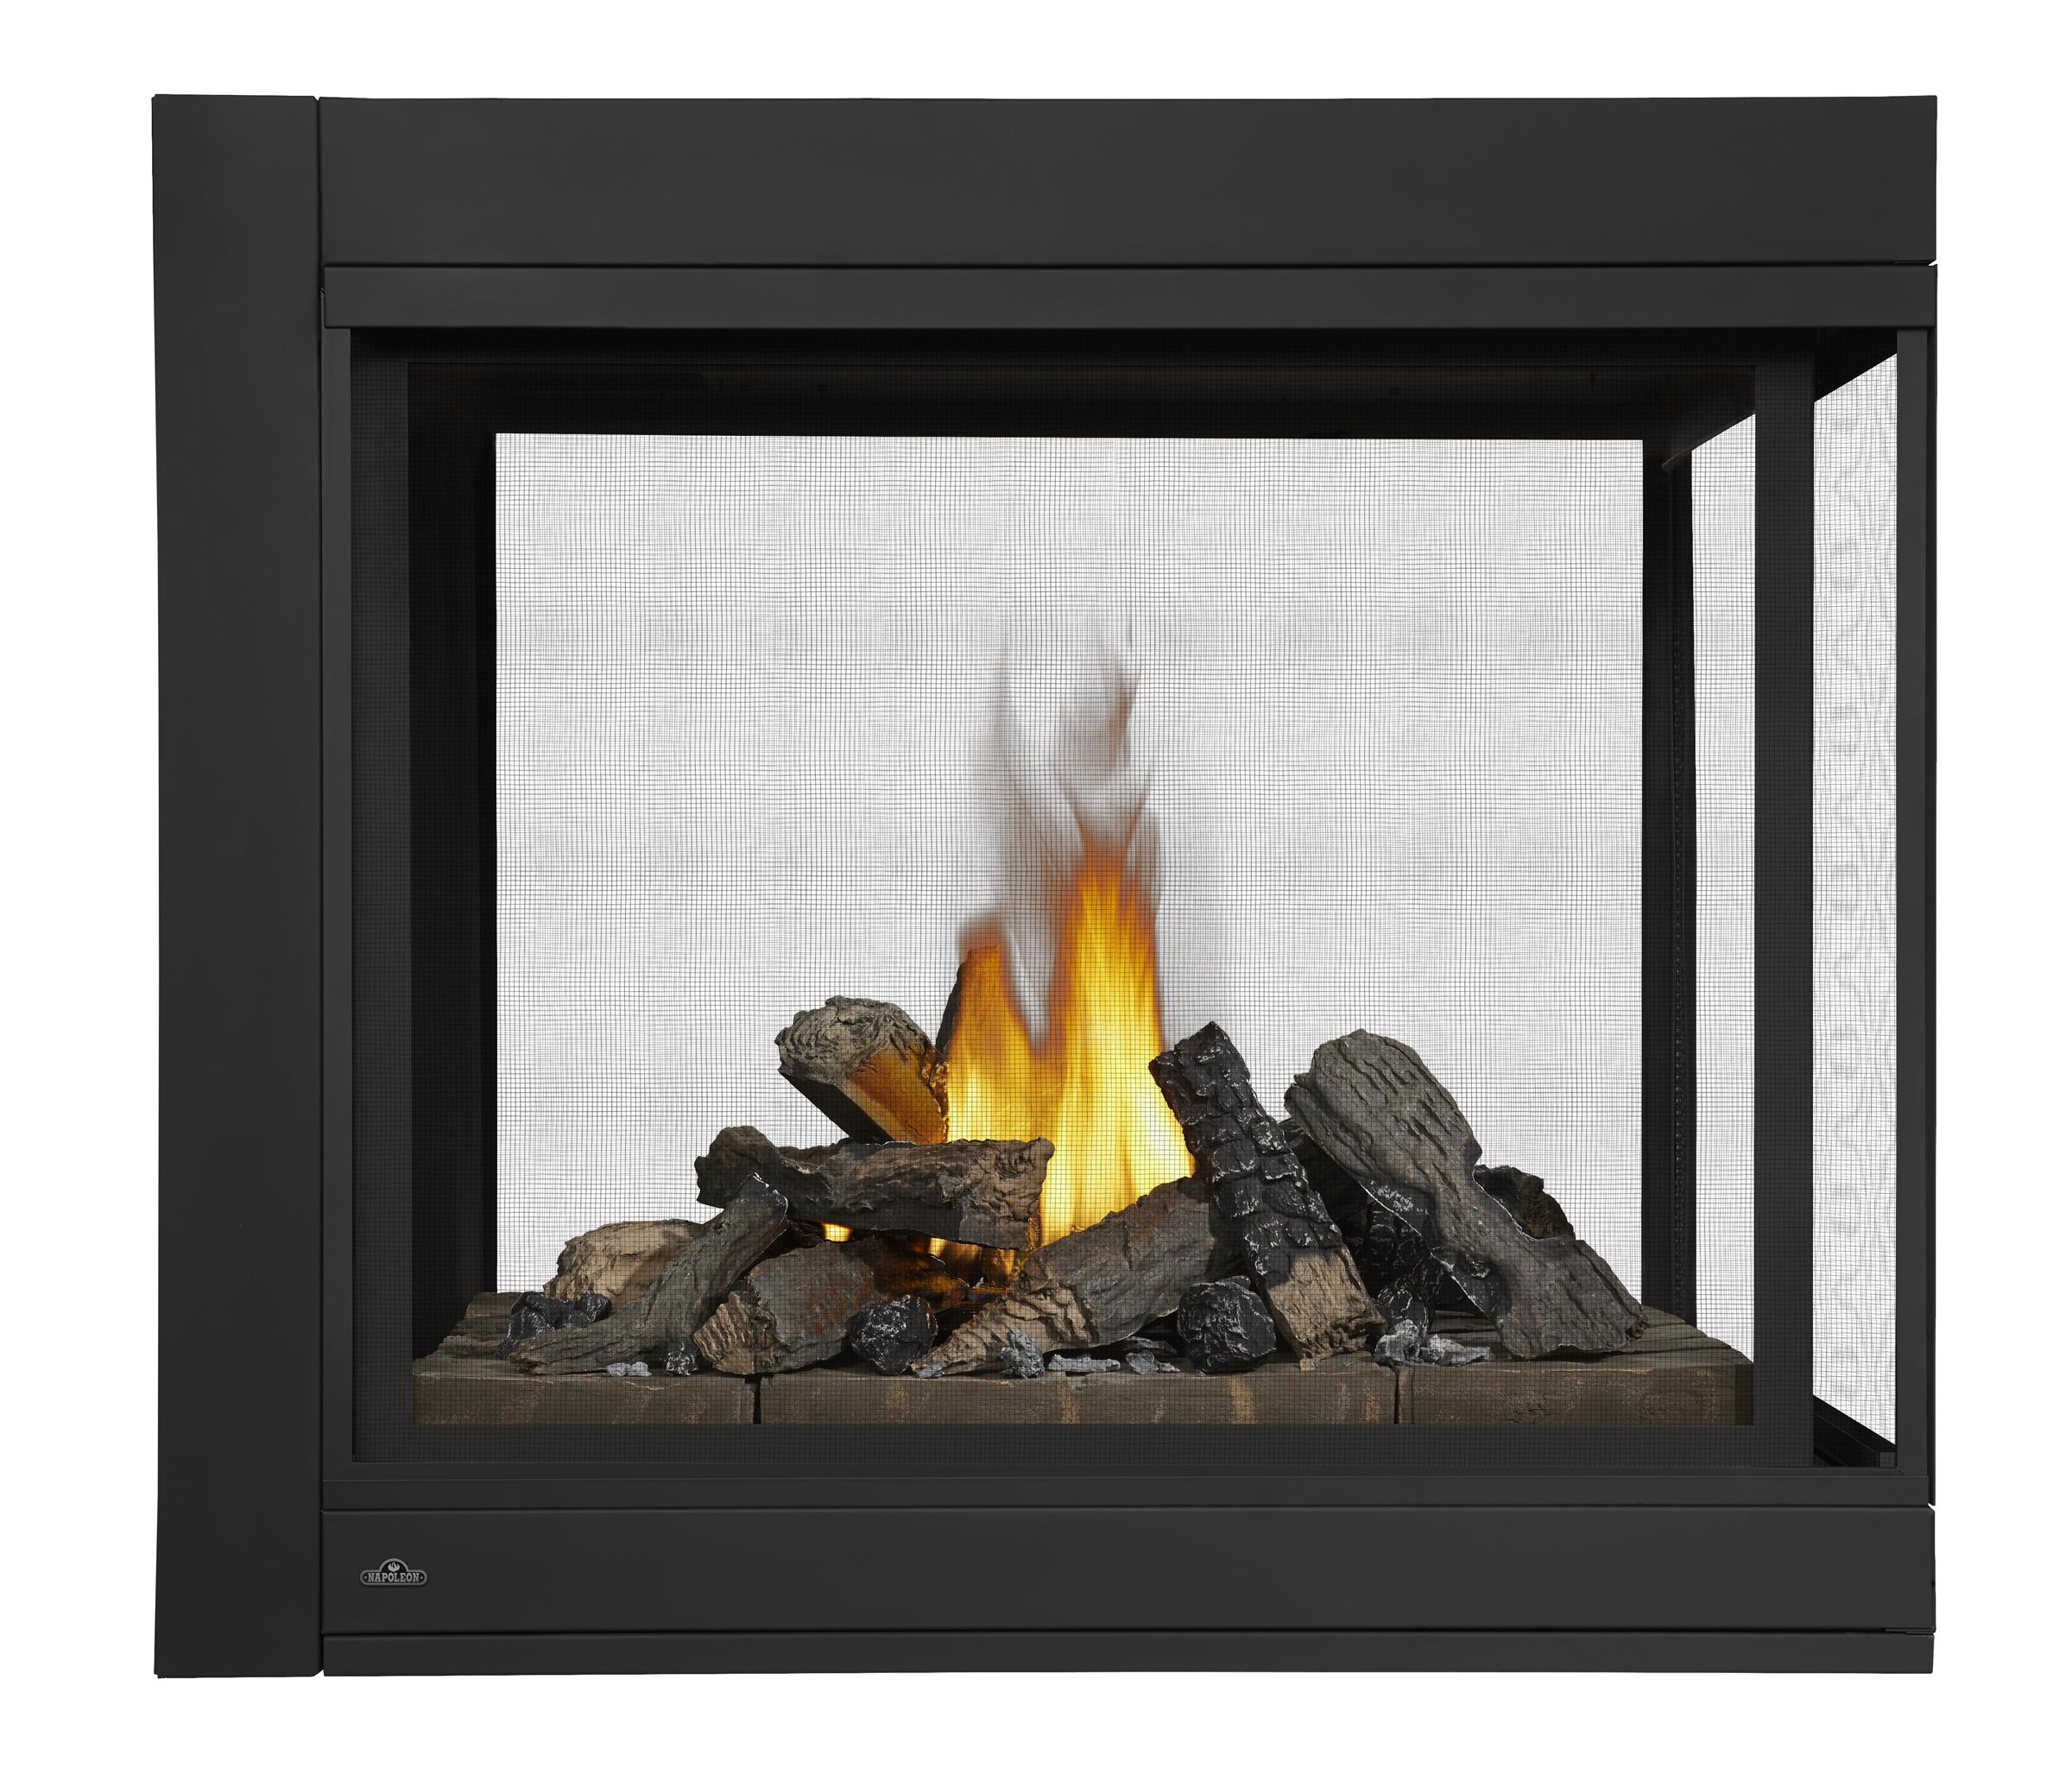 acsent-bhd4p-sb-napoleon-fireplaces.jpg